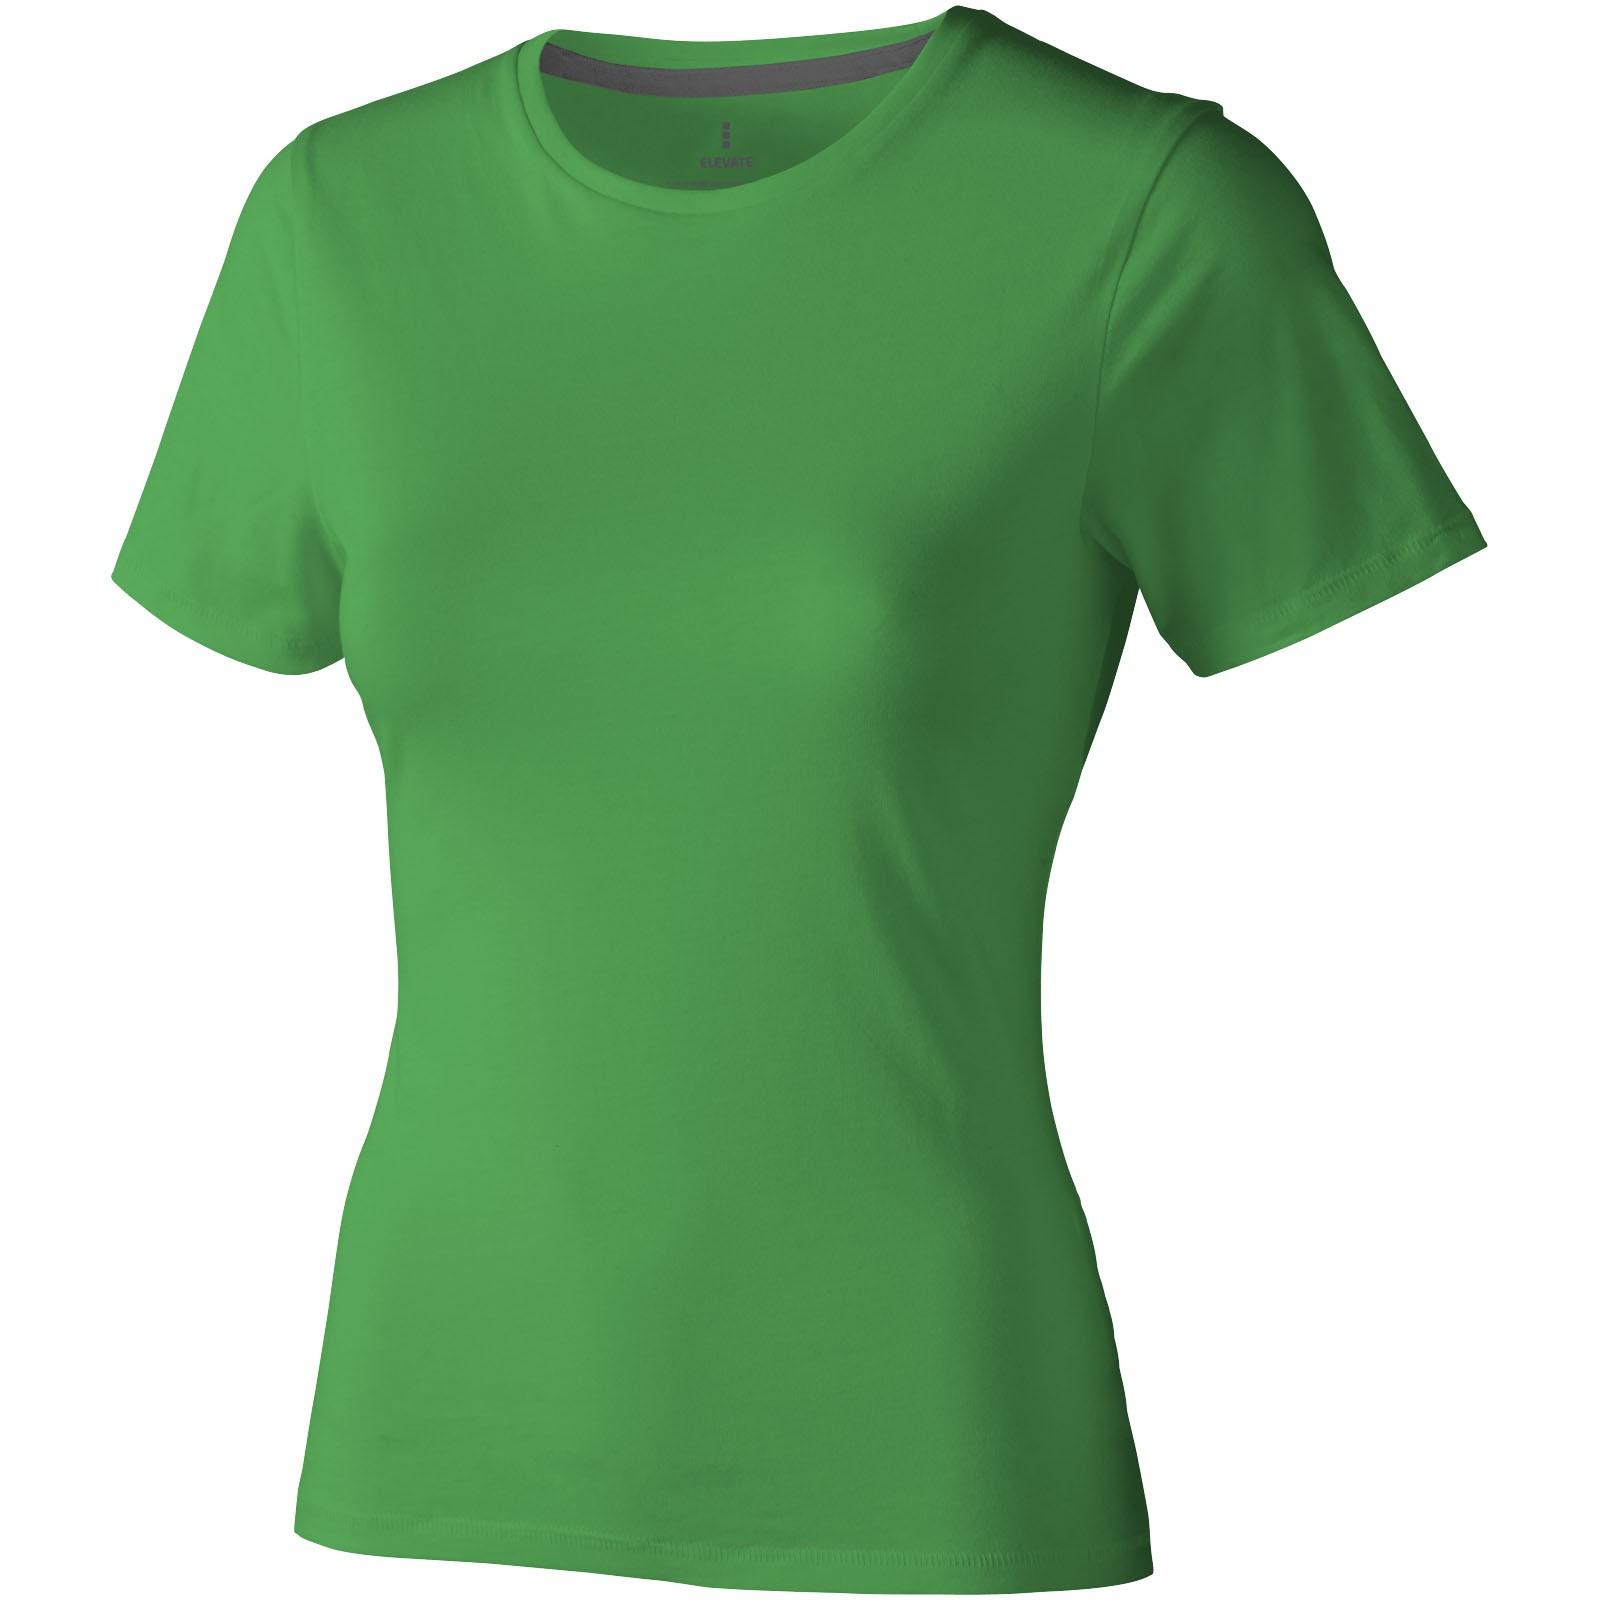 Dámské triko Nanaimo s krátkým rukávem - Fern Green / XXL